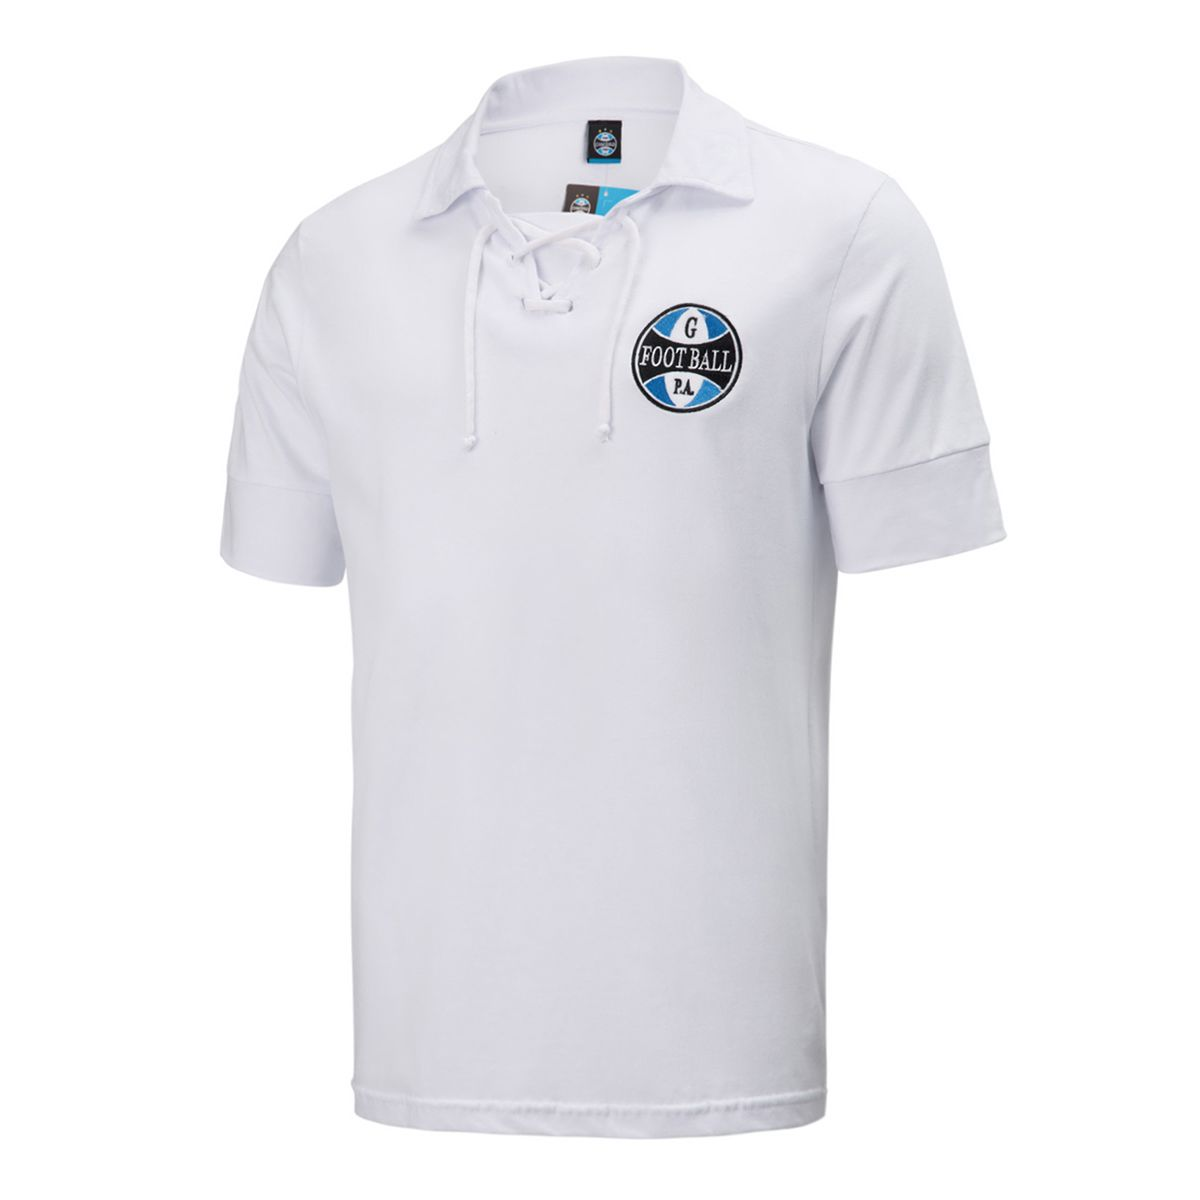 Camisa Polo Grêmio Retrô Branca Masculina